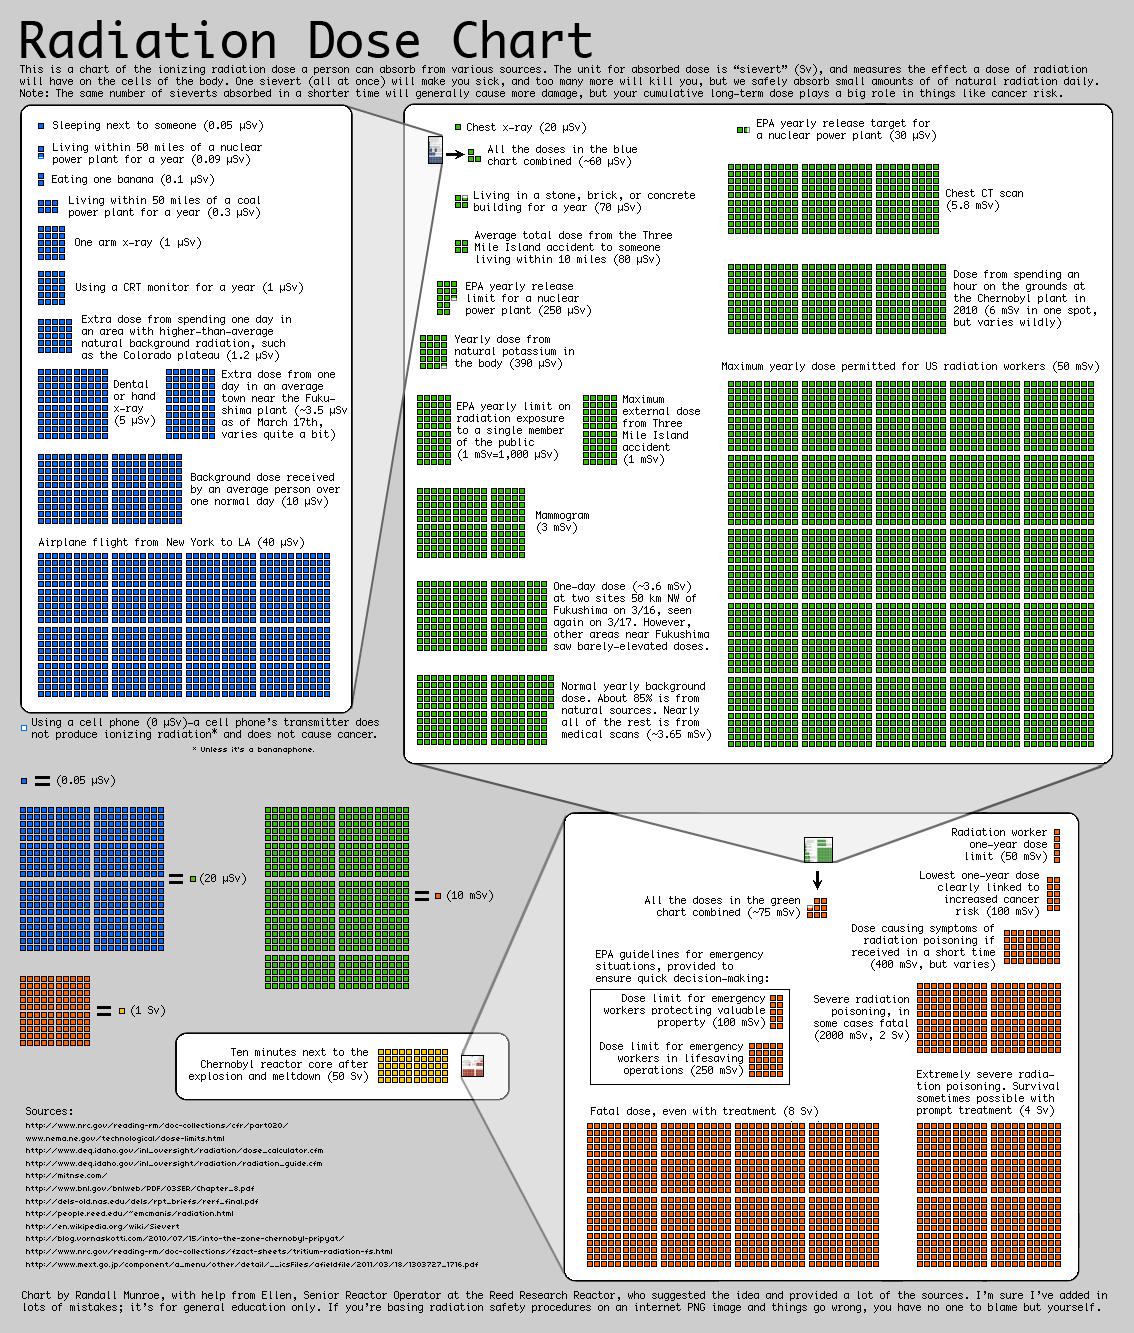 statistici radiatii informatii